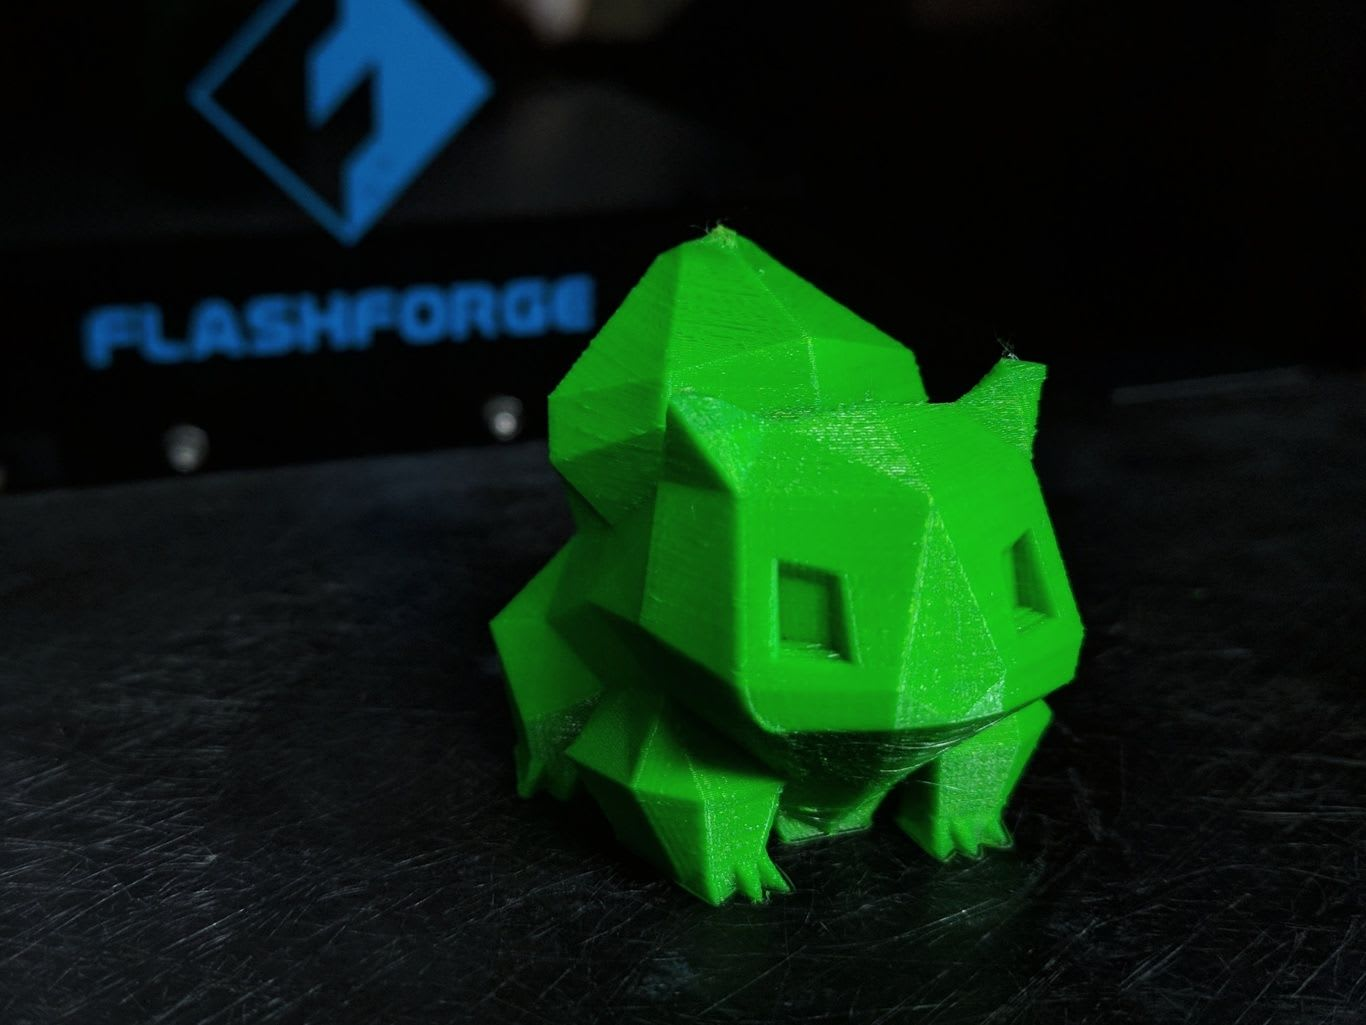 Printing @ 0.2mm & 100 microns